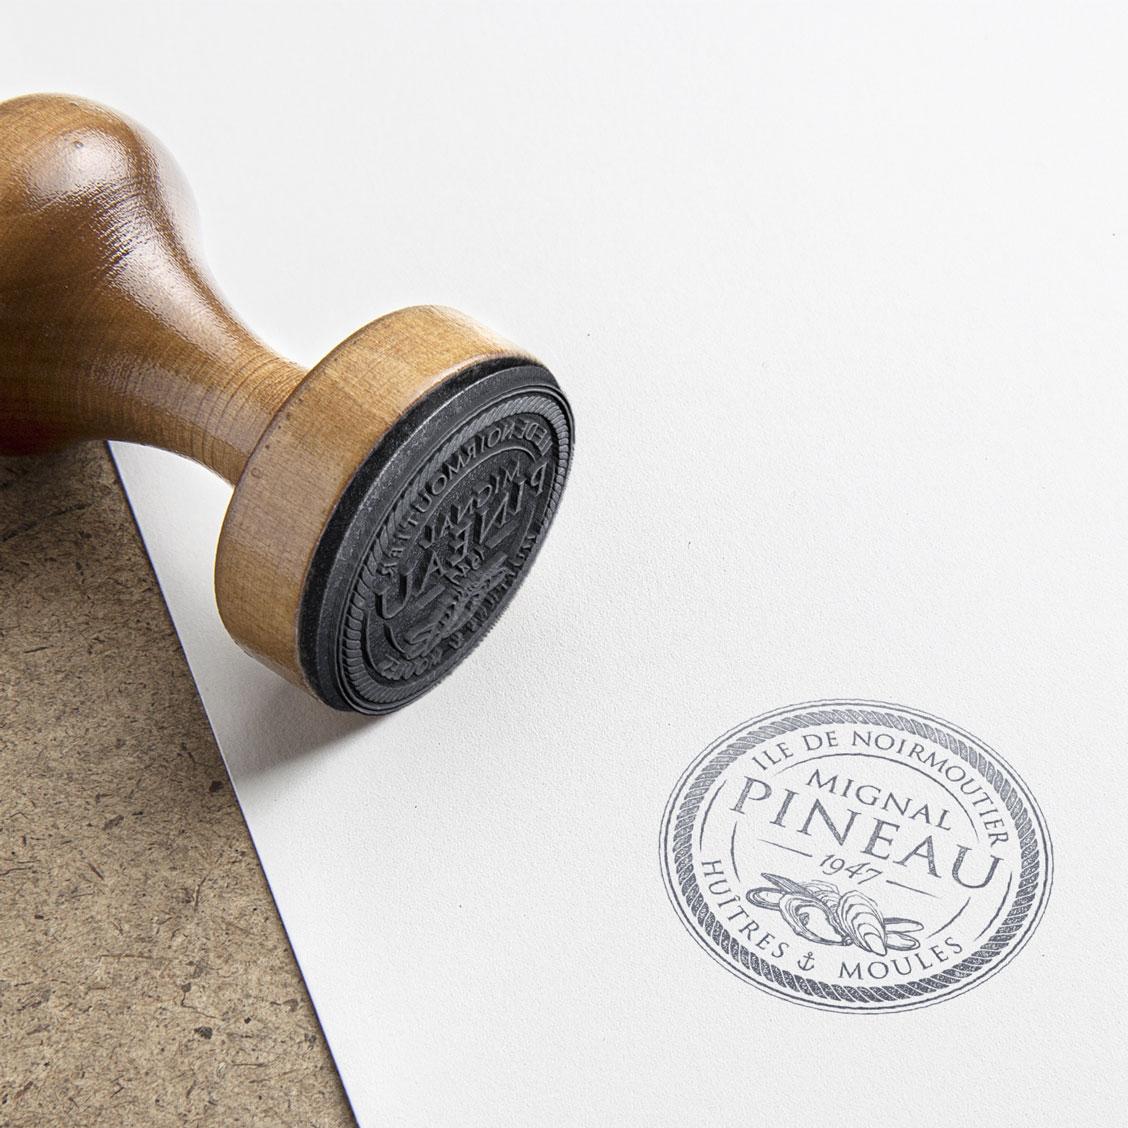 graffocean-creation-tampon-encreur-noirmoutier-pineau-mignal